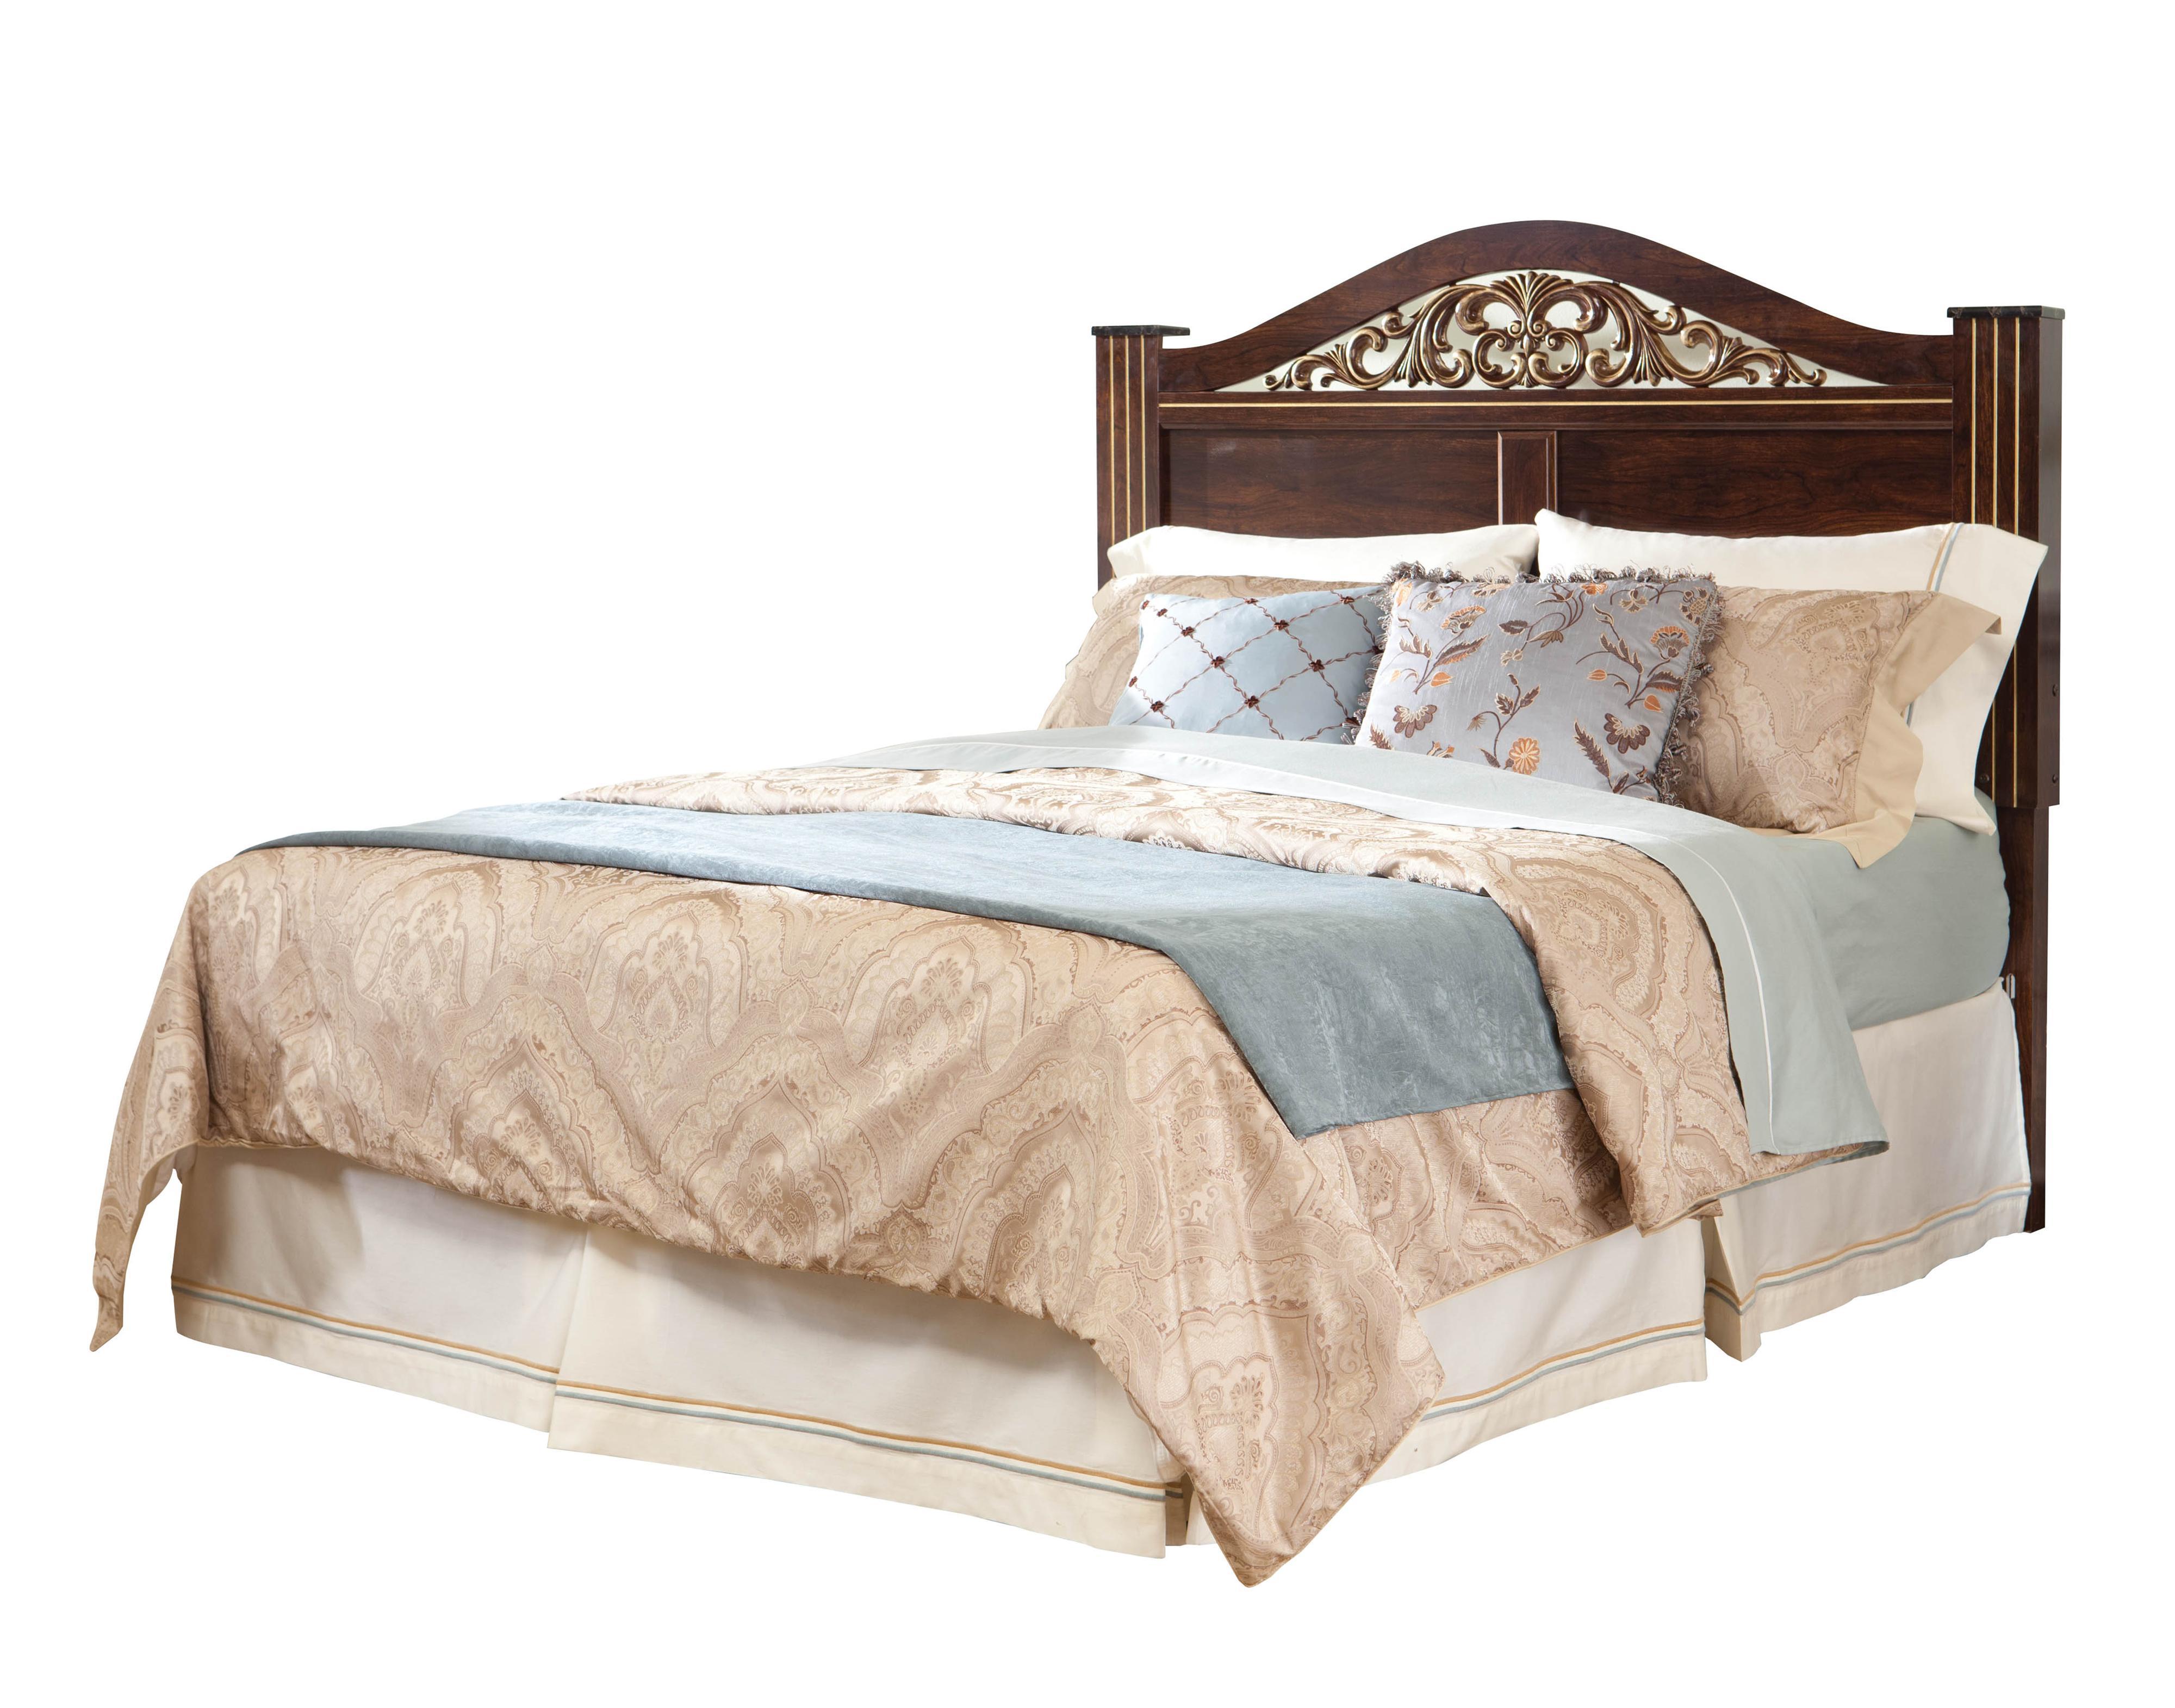 Standard Furniture Odessa King Headboard - Item Number: 69516